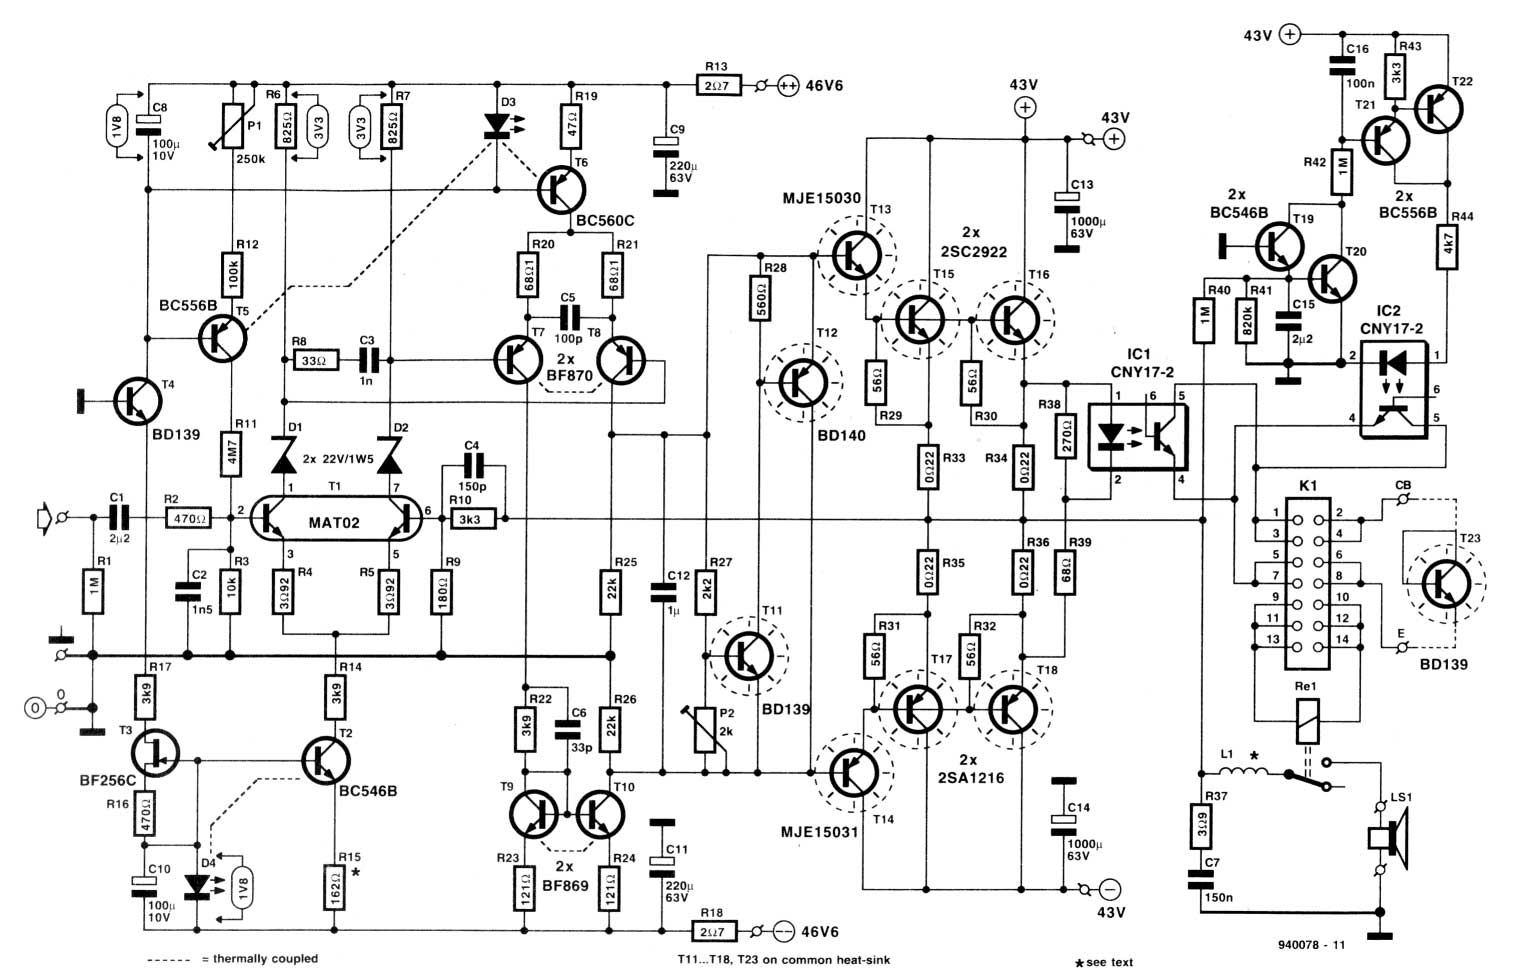 carvin bass amp schematics